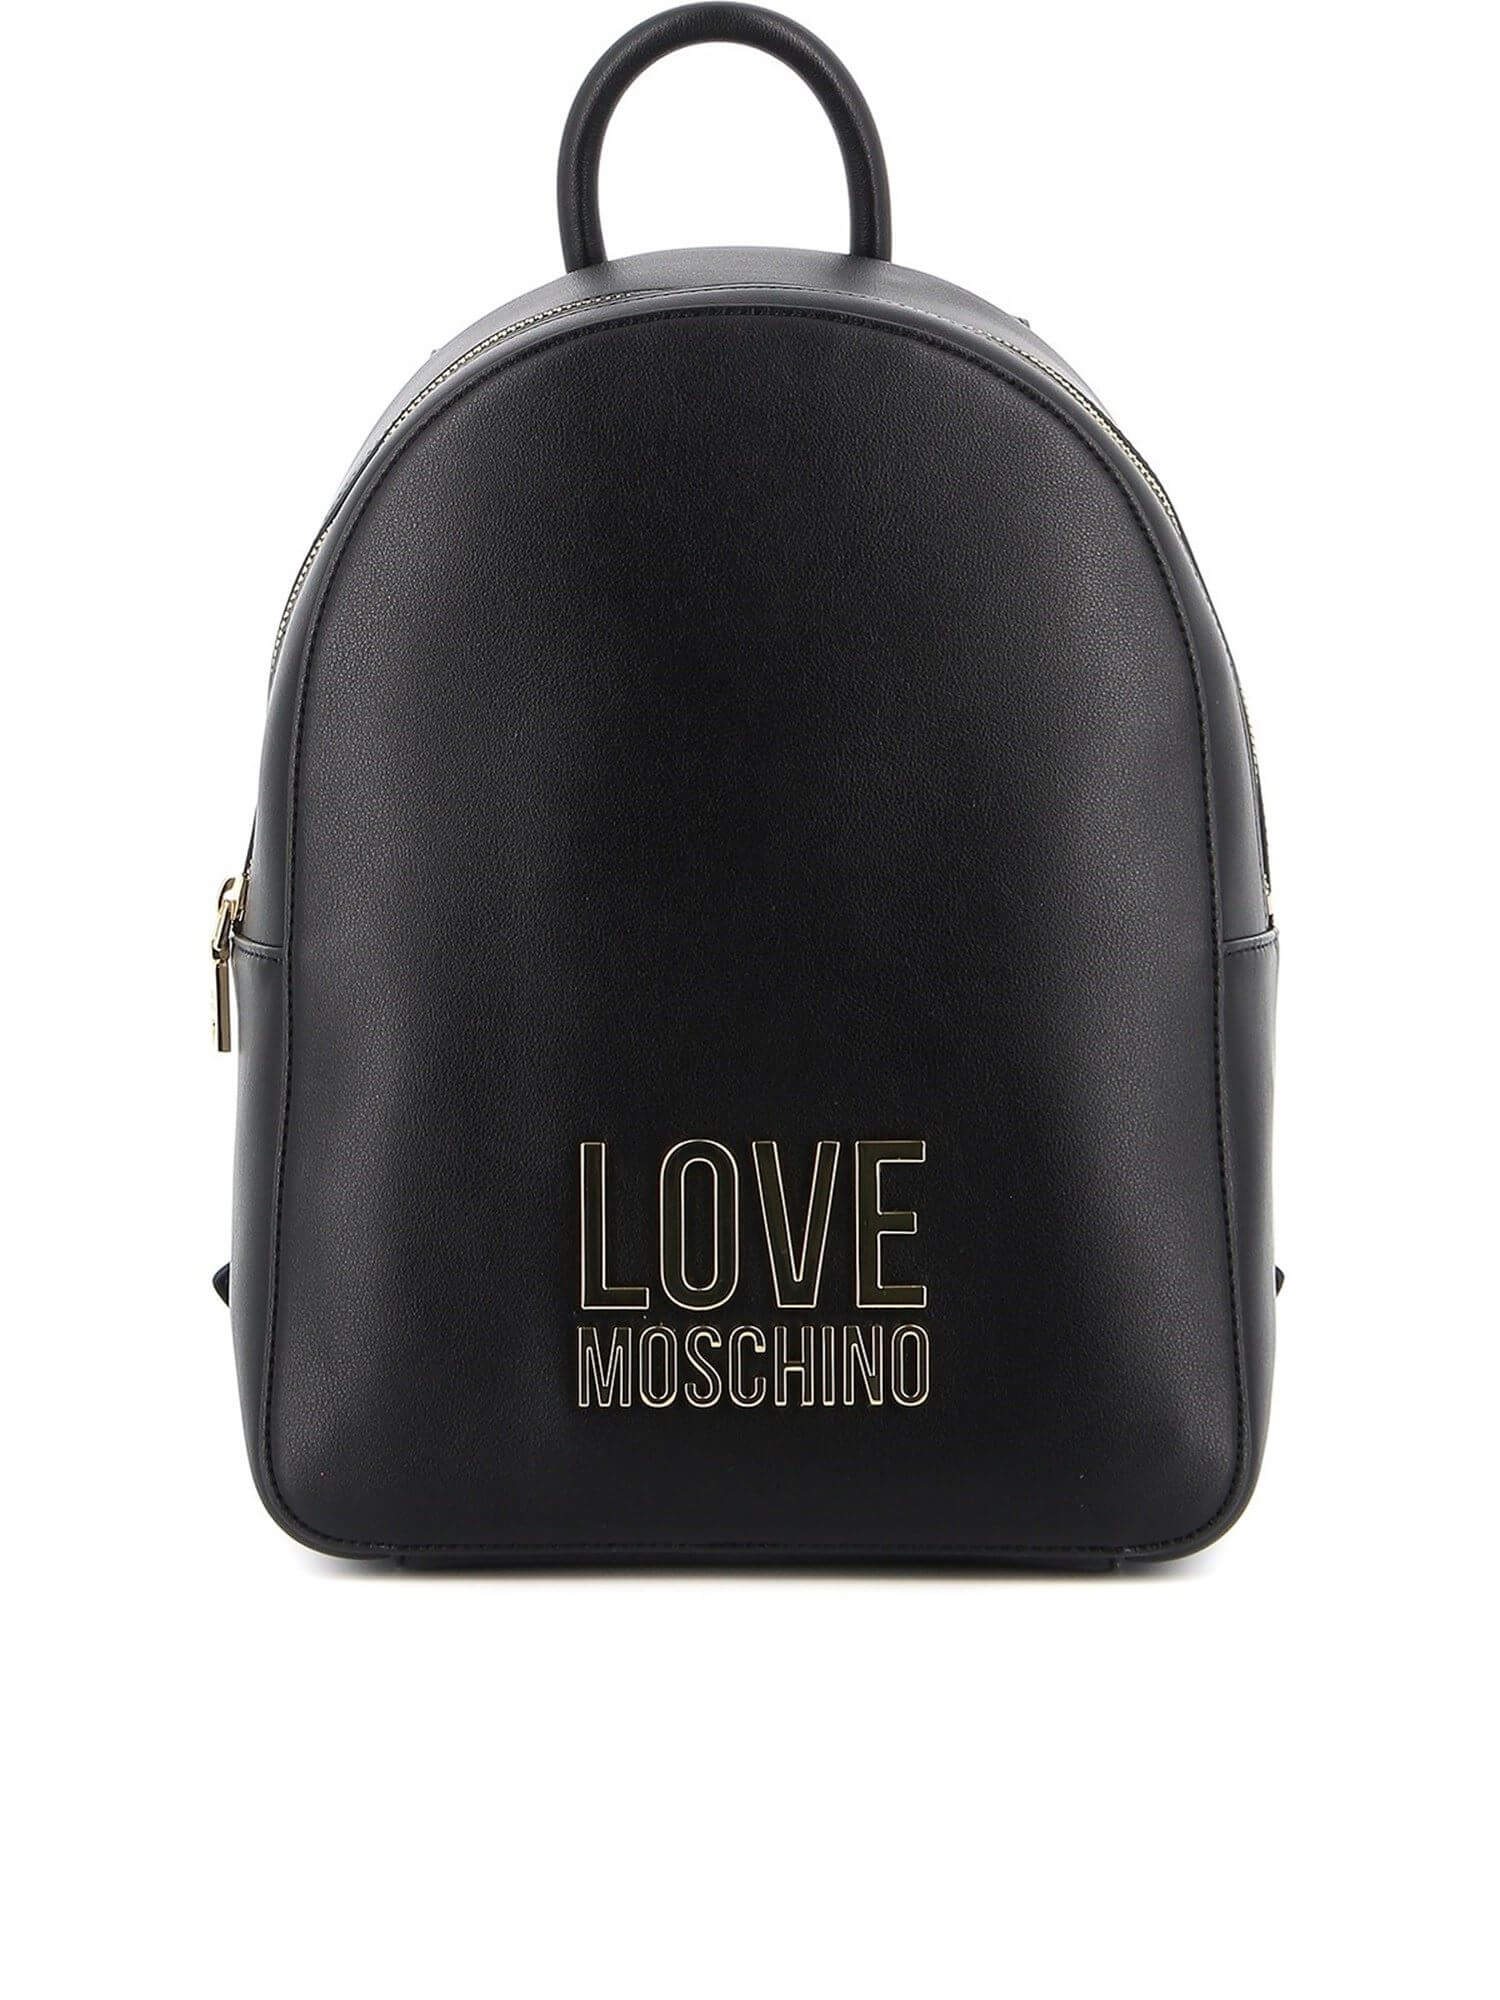 Zaino Love Moschino Bonded Nero e Logo Oro - Donna